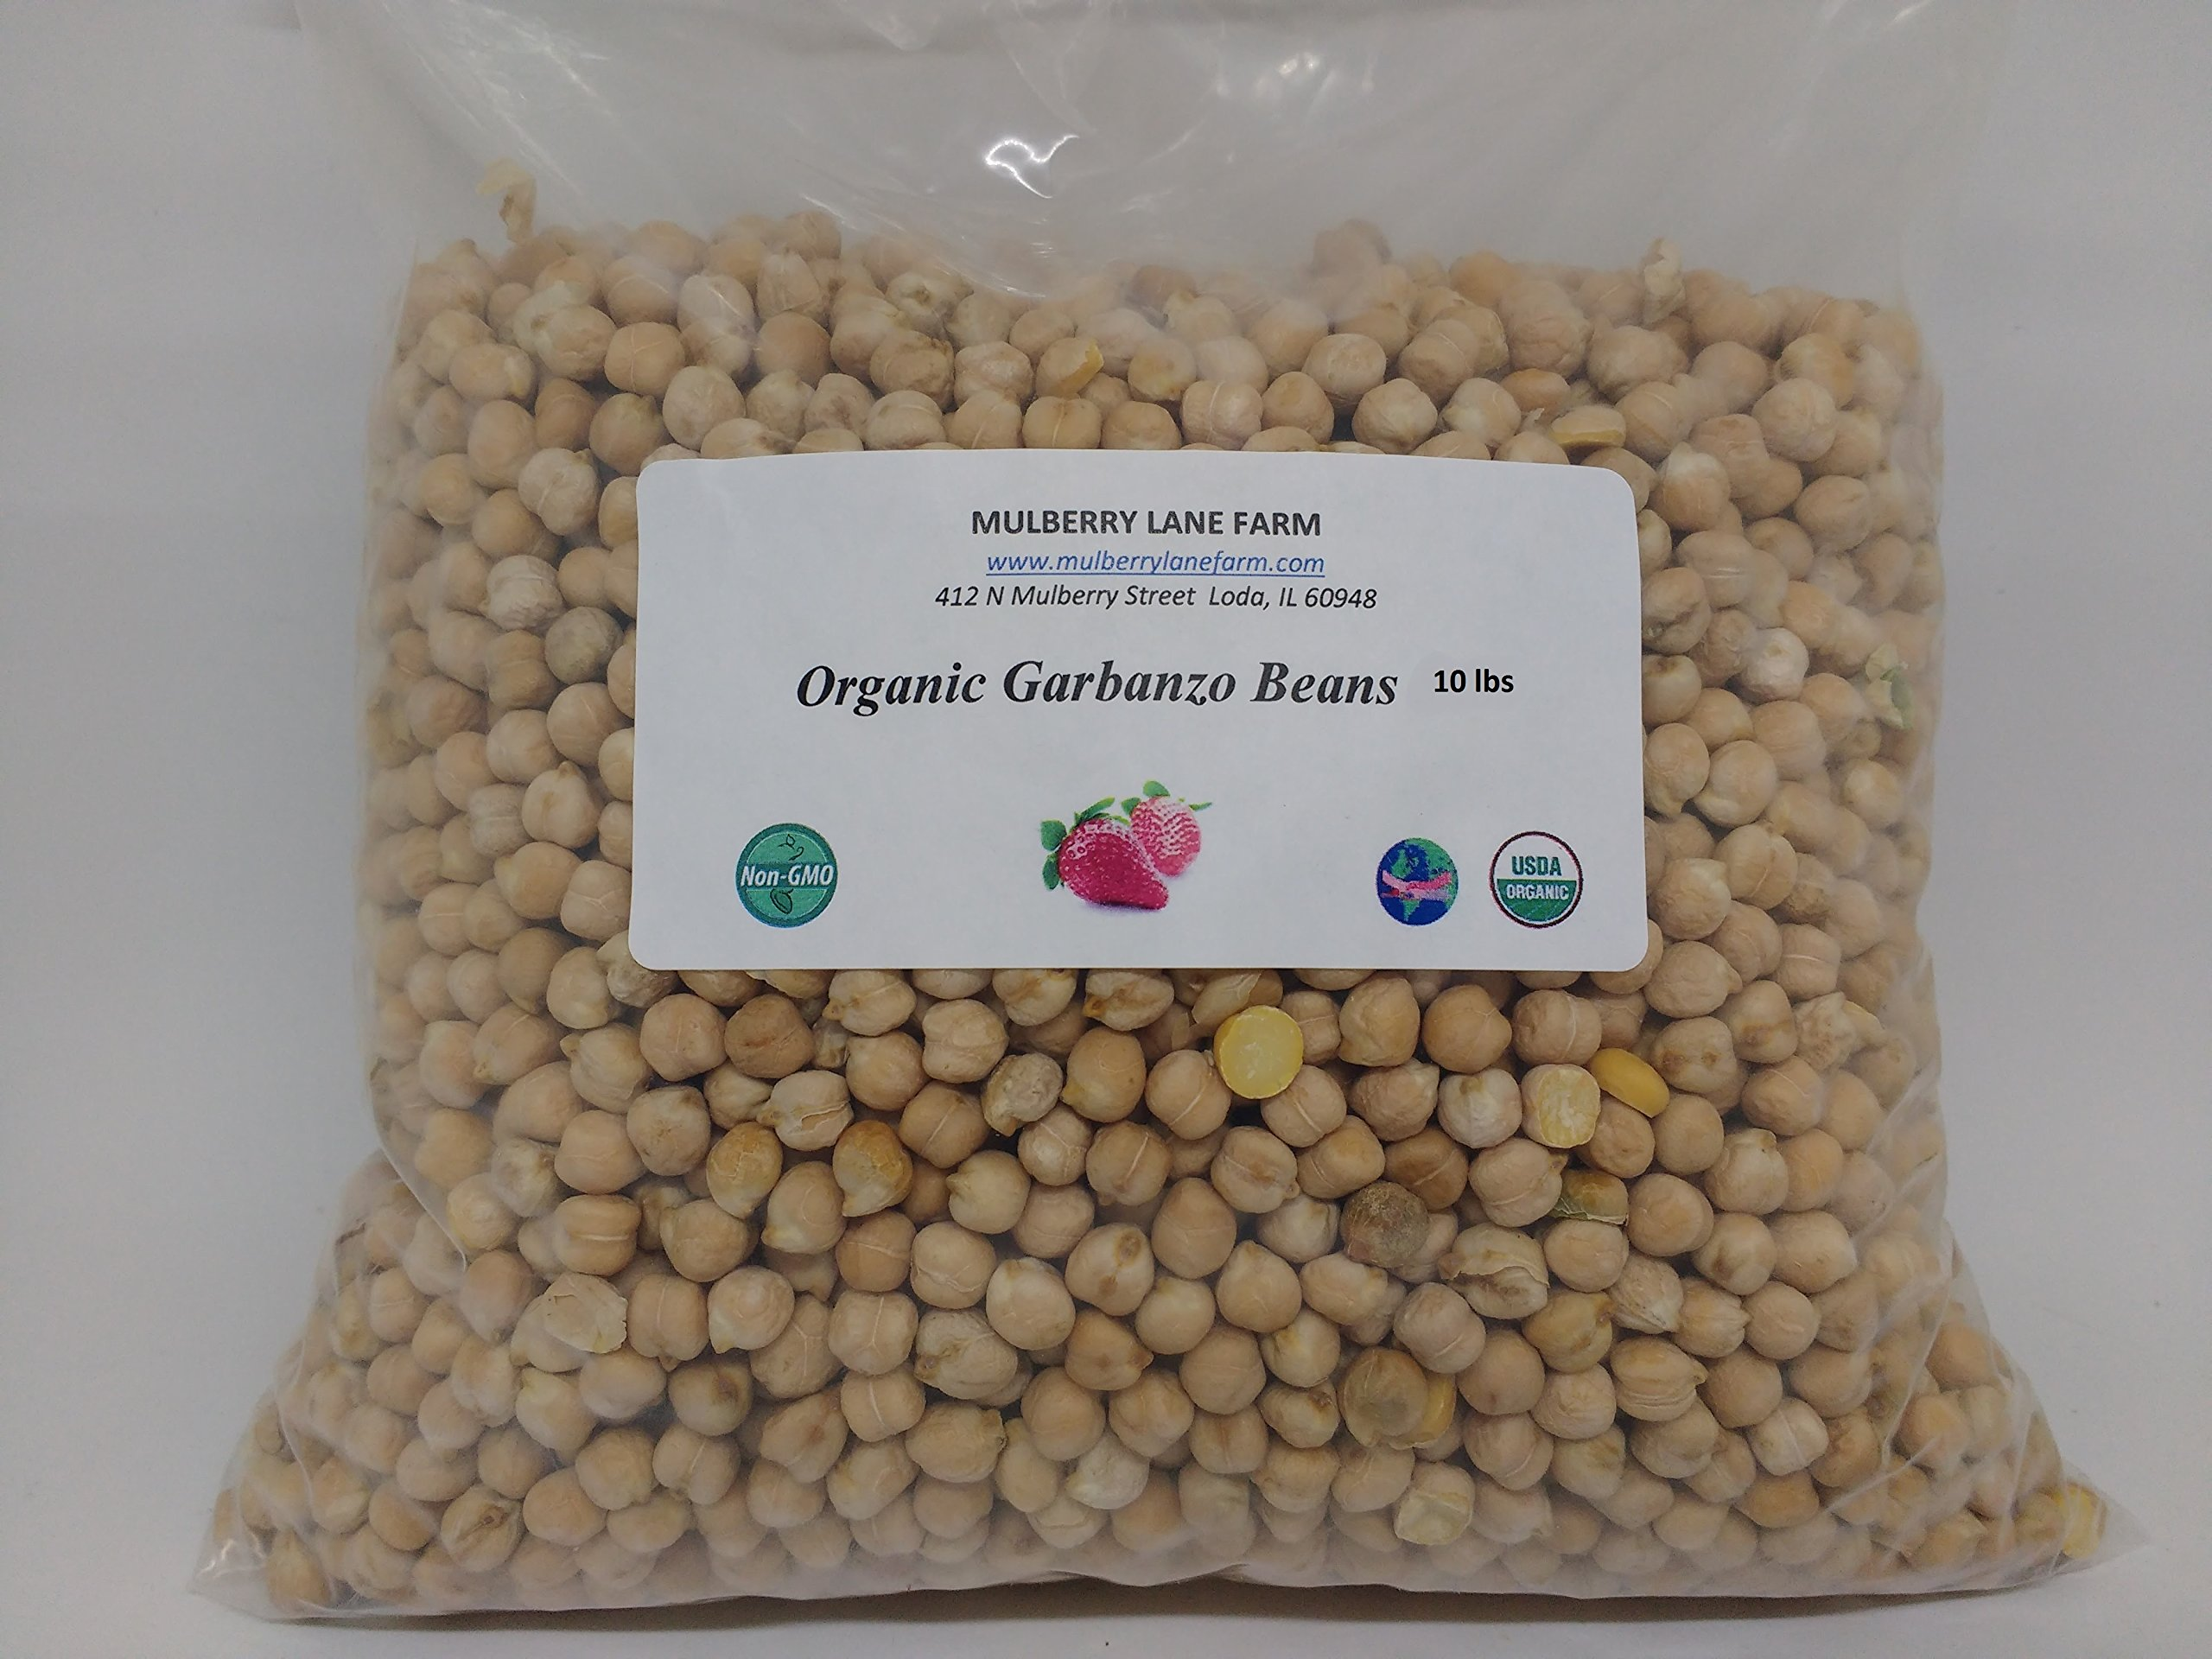 Garbanzo Beans, 10 lbs (Ten Pounds), (Chick Peas), USDA Certified Organic, Non-GMO, Dried, Great for Hummus! BULK.